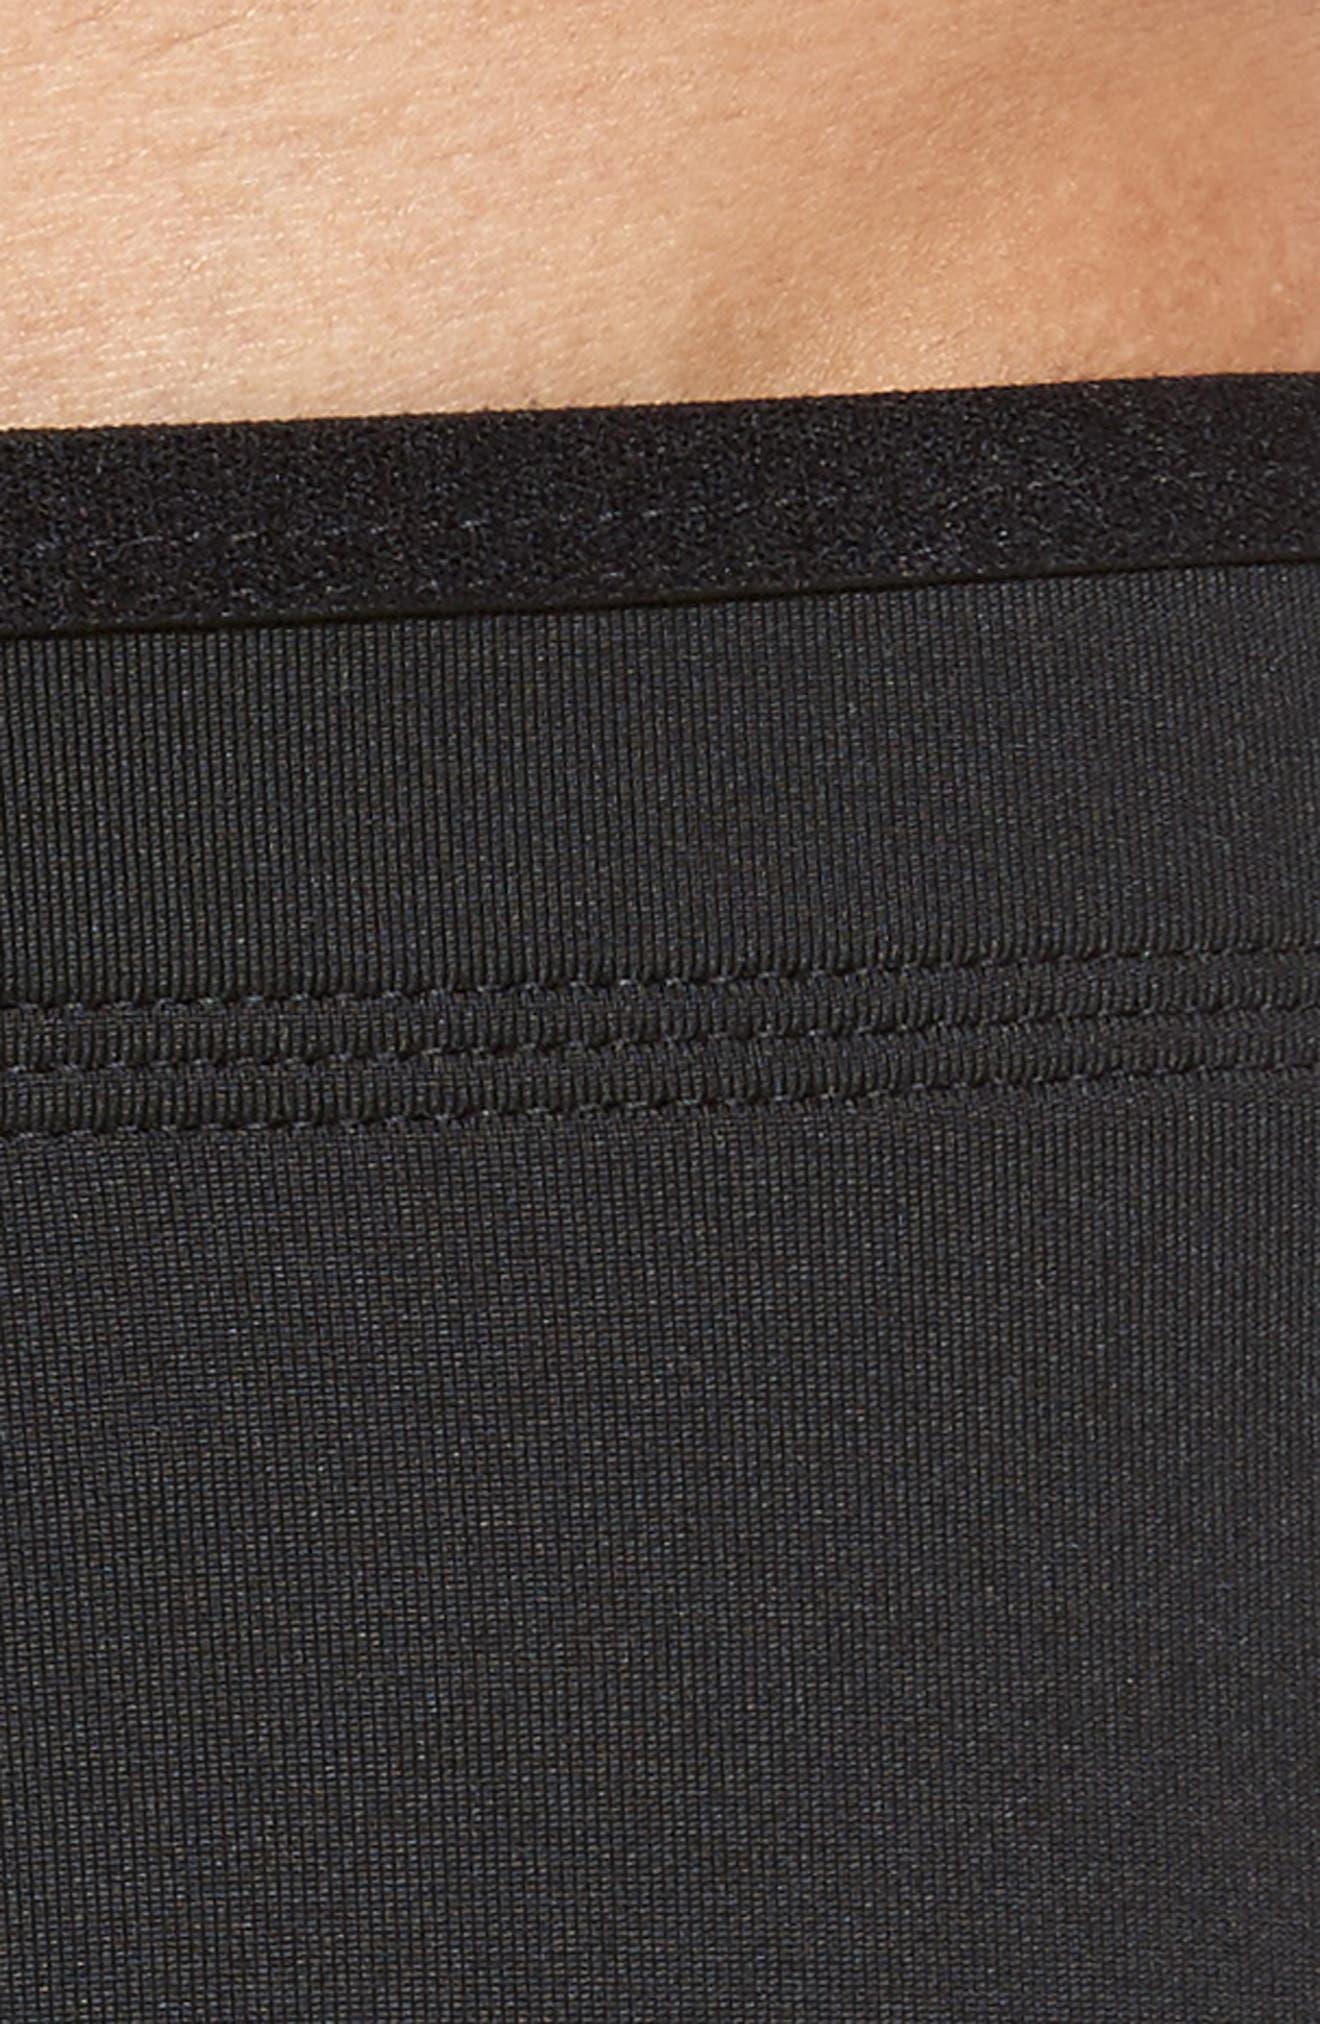 Sport Compression Shorts,                             Alternate thumbnail 4, color,                             001